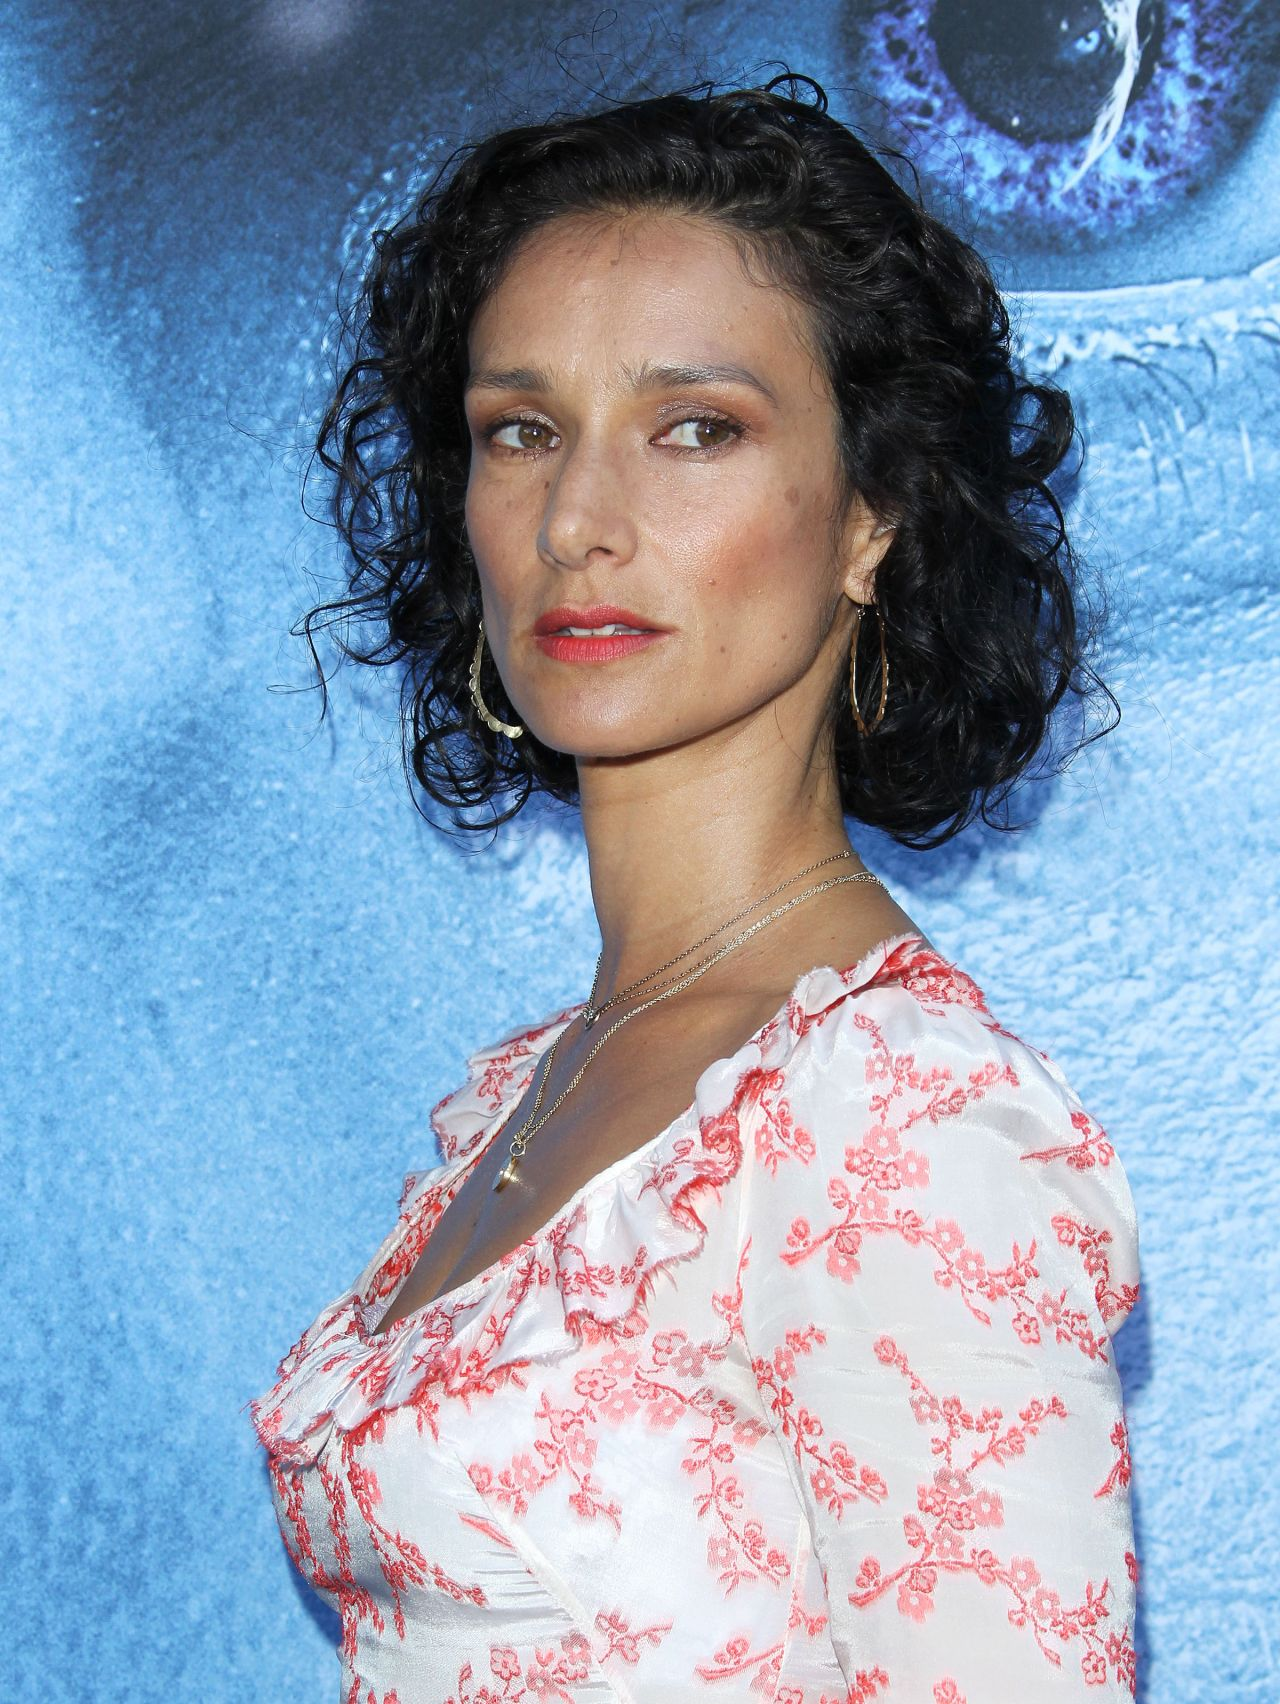 The Latest Celebrity Picture: Indira Varma